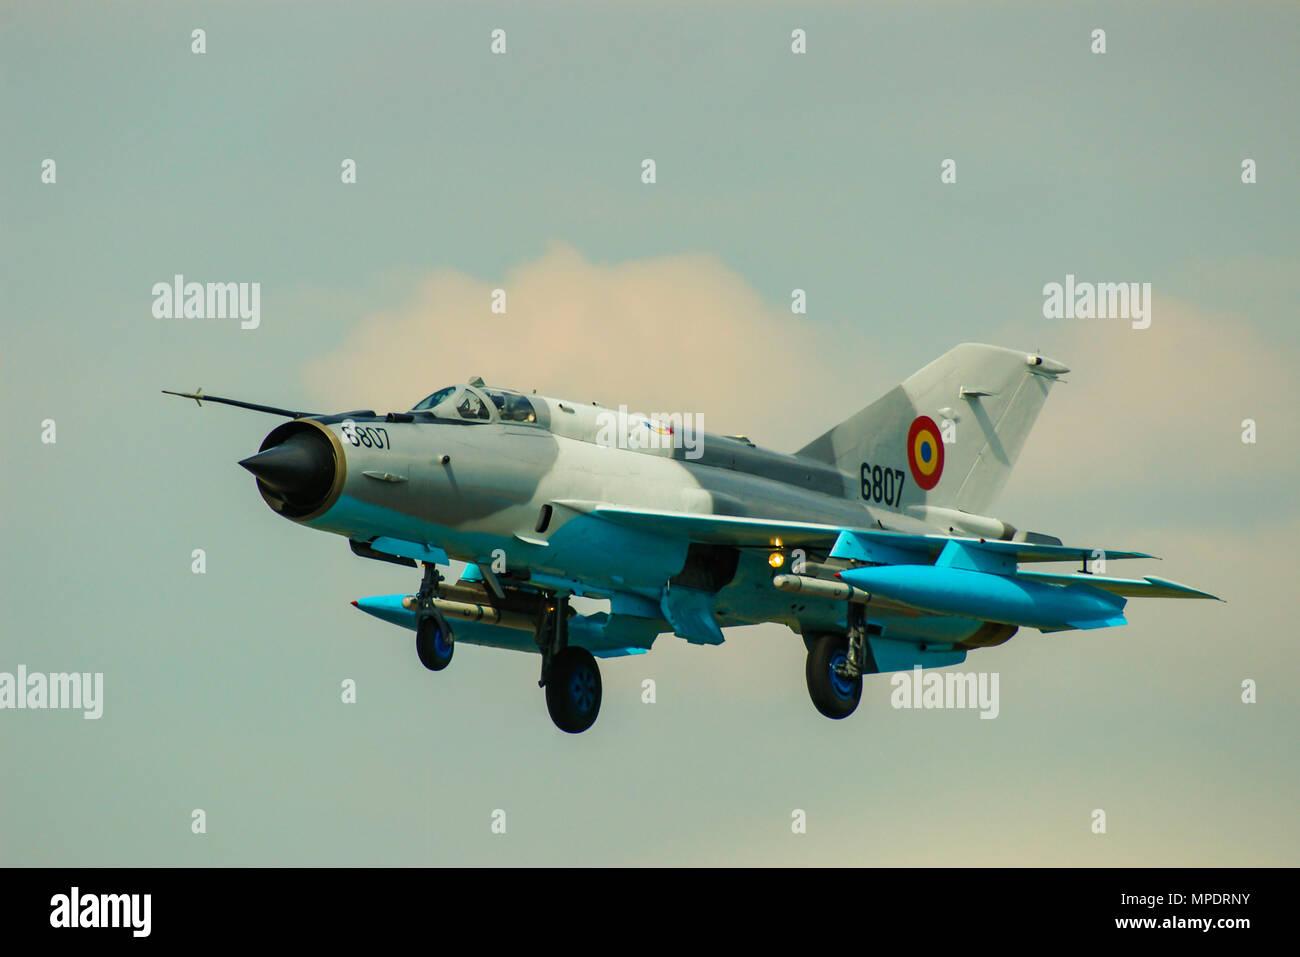 romanian-air-force-mikoyan-gurevich-mig-21-lancer-fighter-jet-plane-landing-soviet-cold-war-era-aircraft-still-in-service-with-romania-MPDRNY.jpg